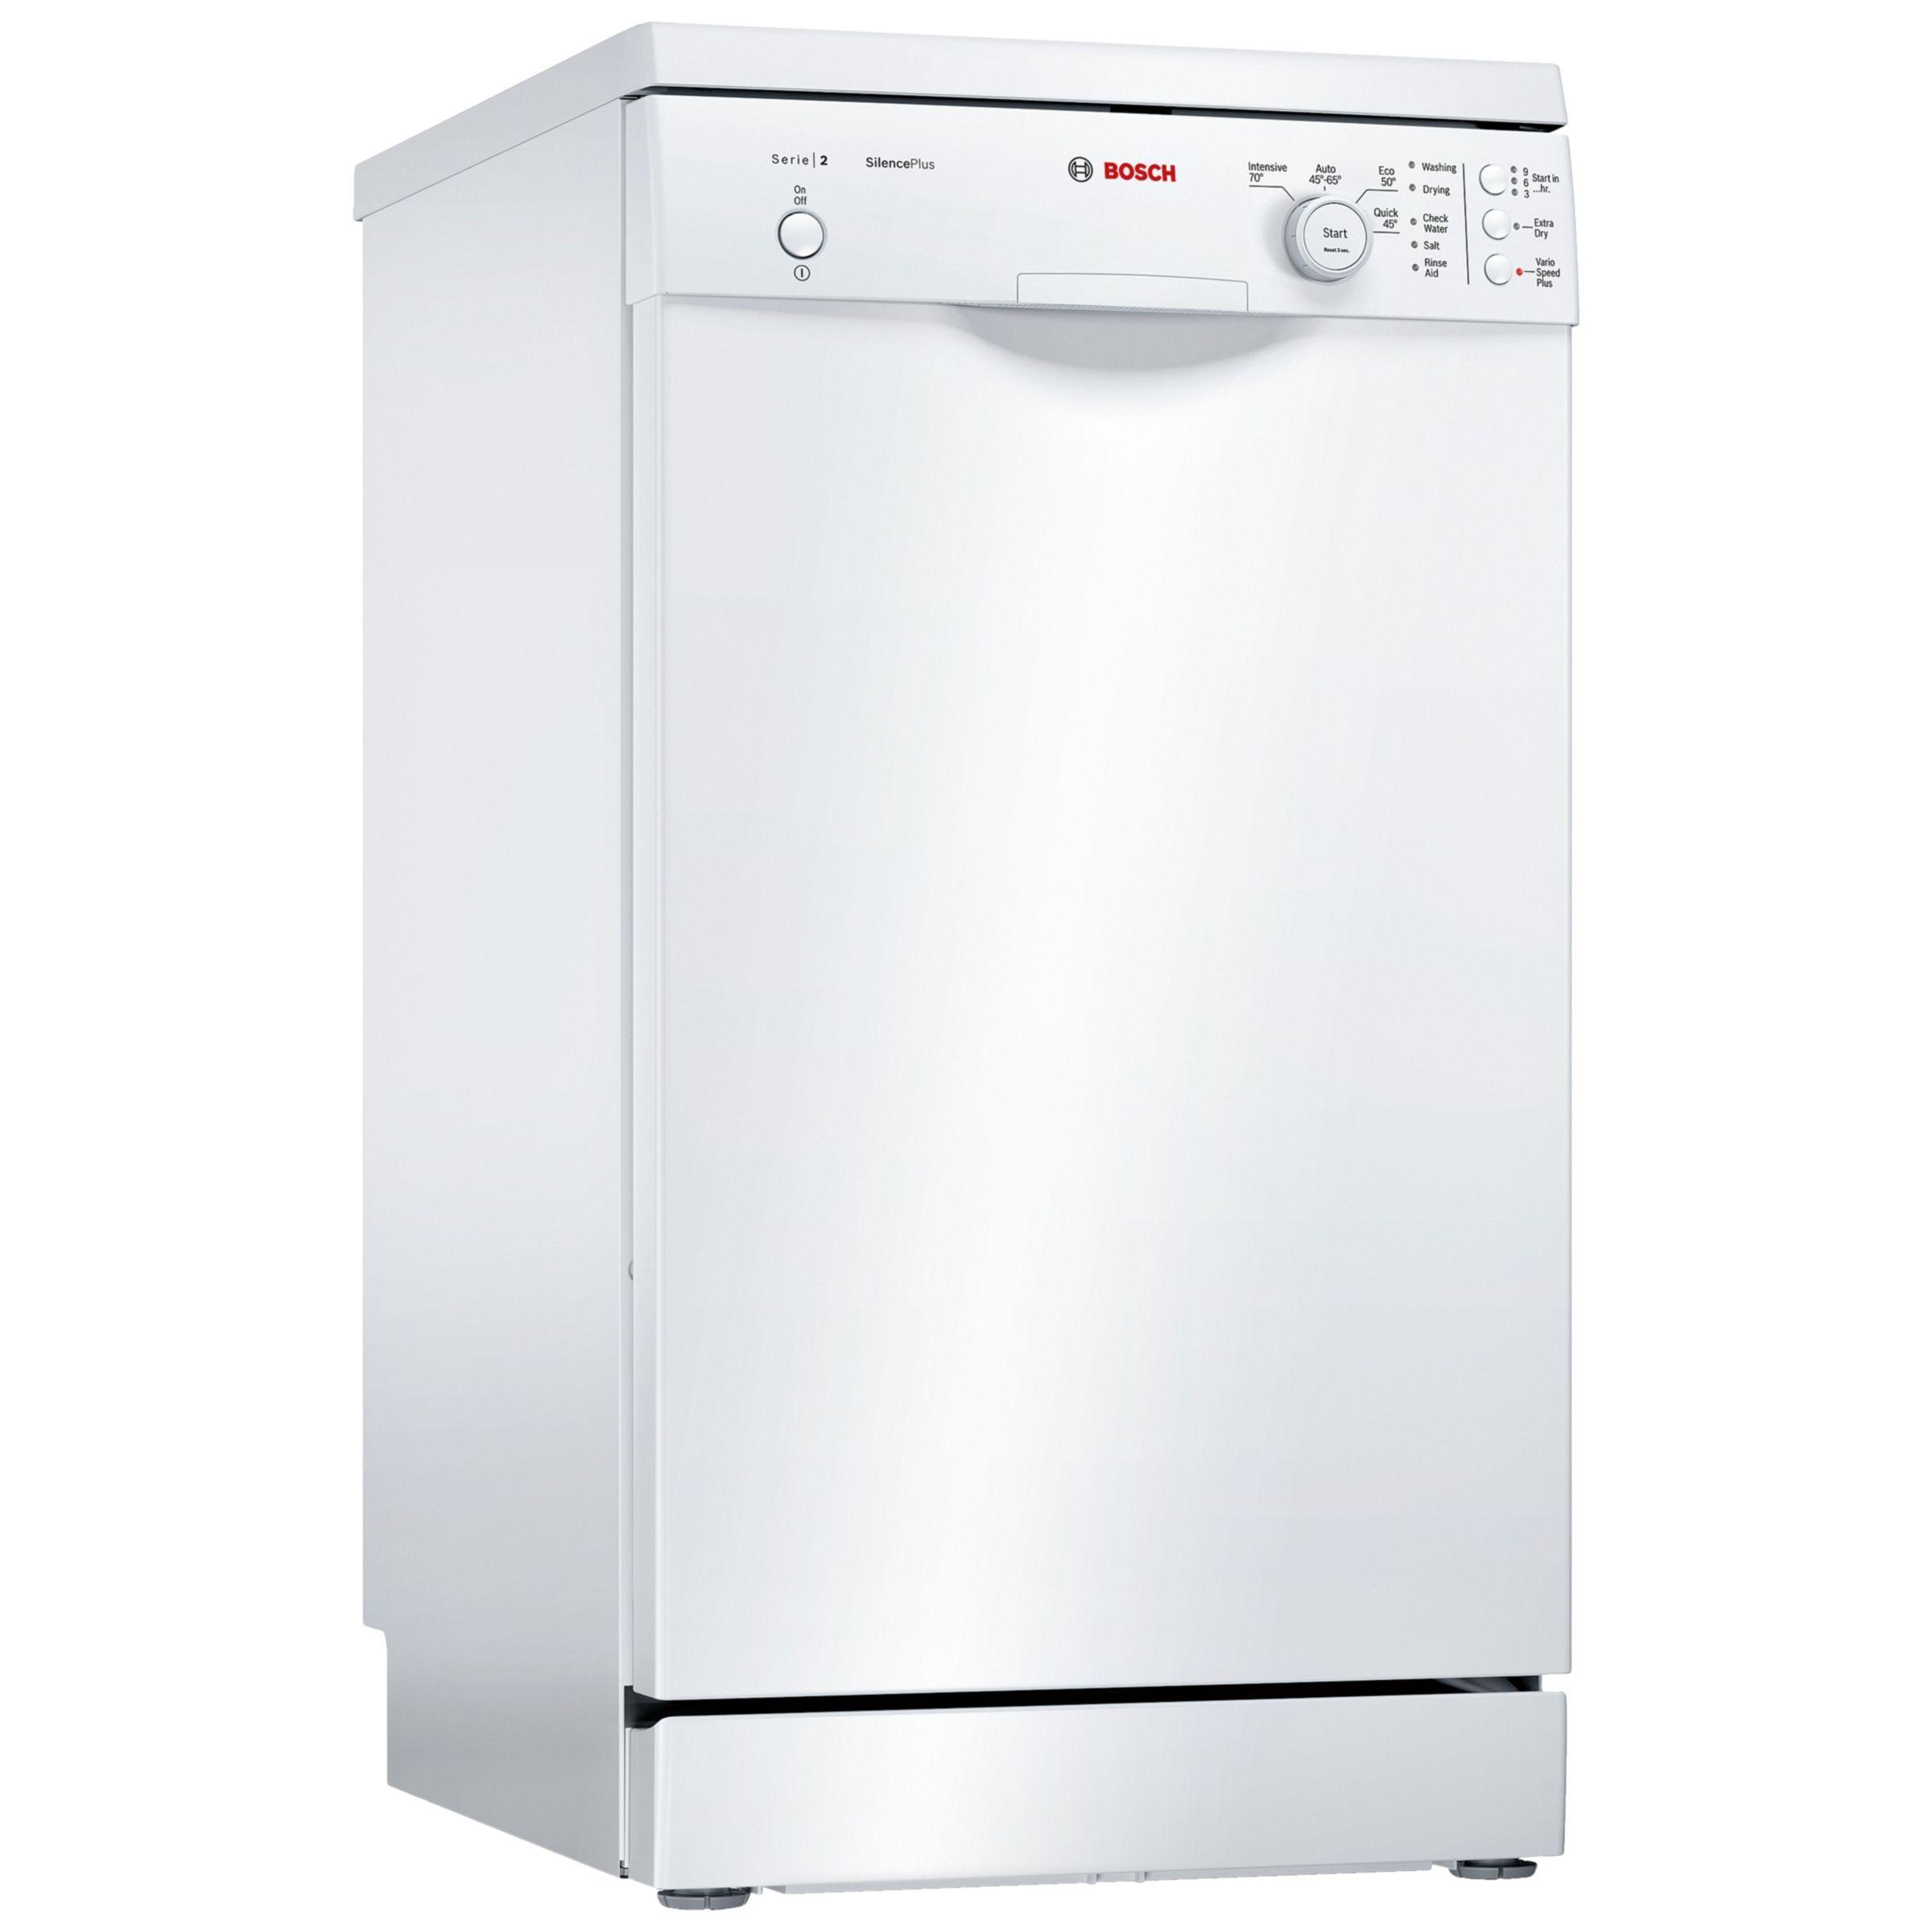 Bosch SPS24CW00G Freestanding Slimline Dishwasher, White